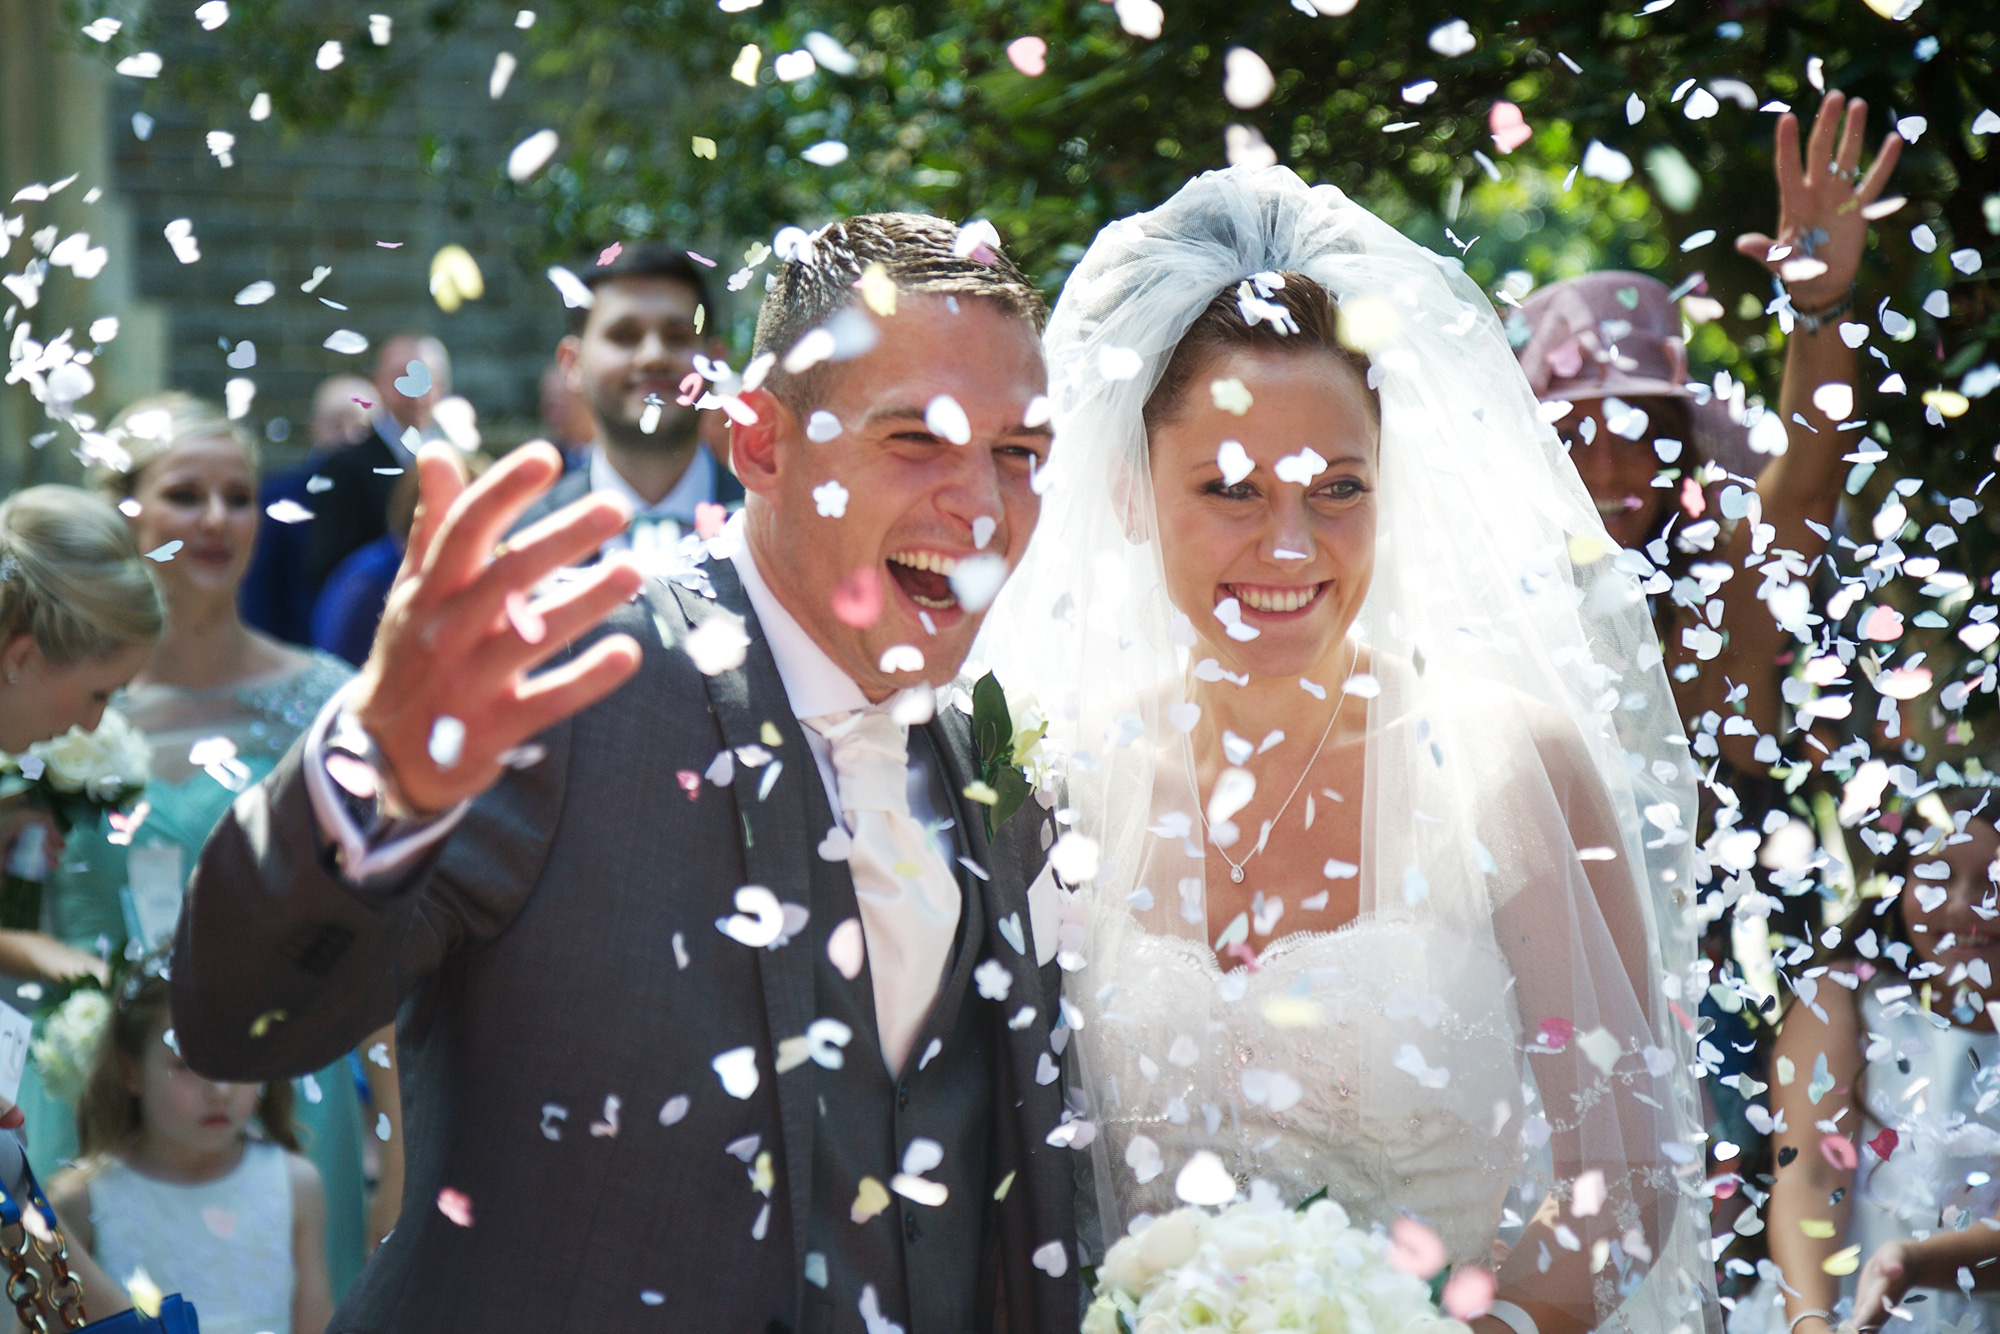 Adam_Hillier_Wedding_Photographer_Newbury_Berkshire_3 (4).jpg